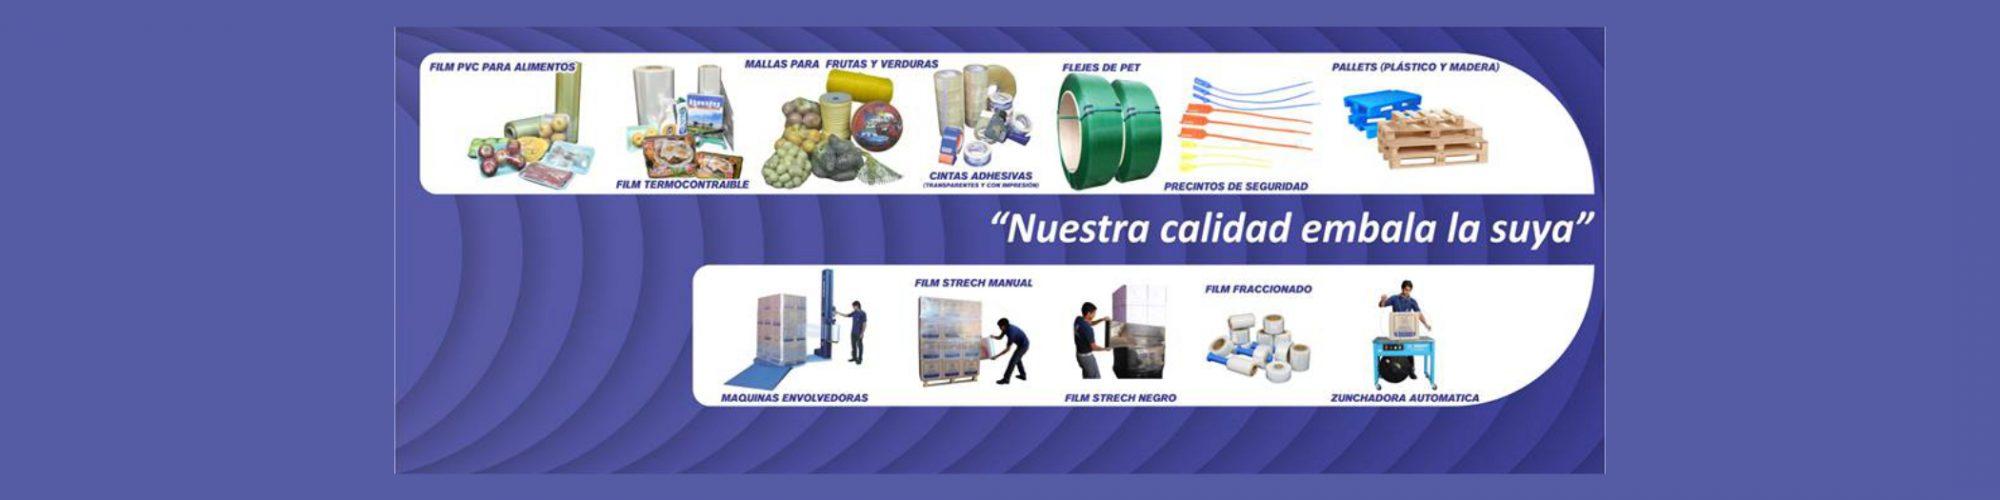 cabecera02